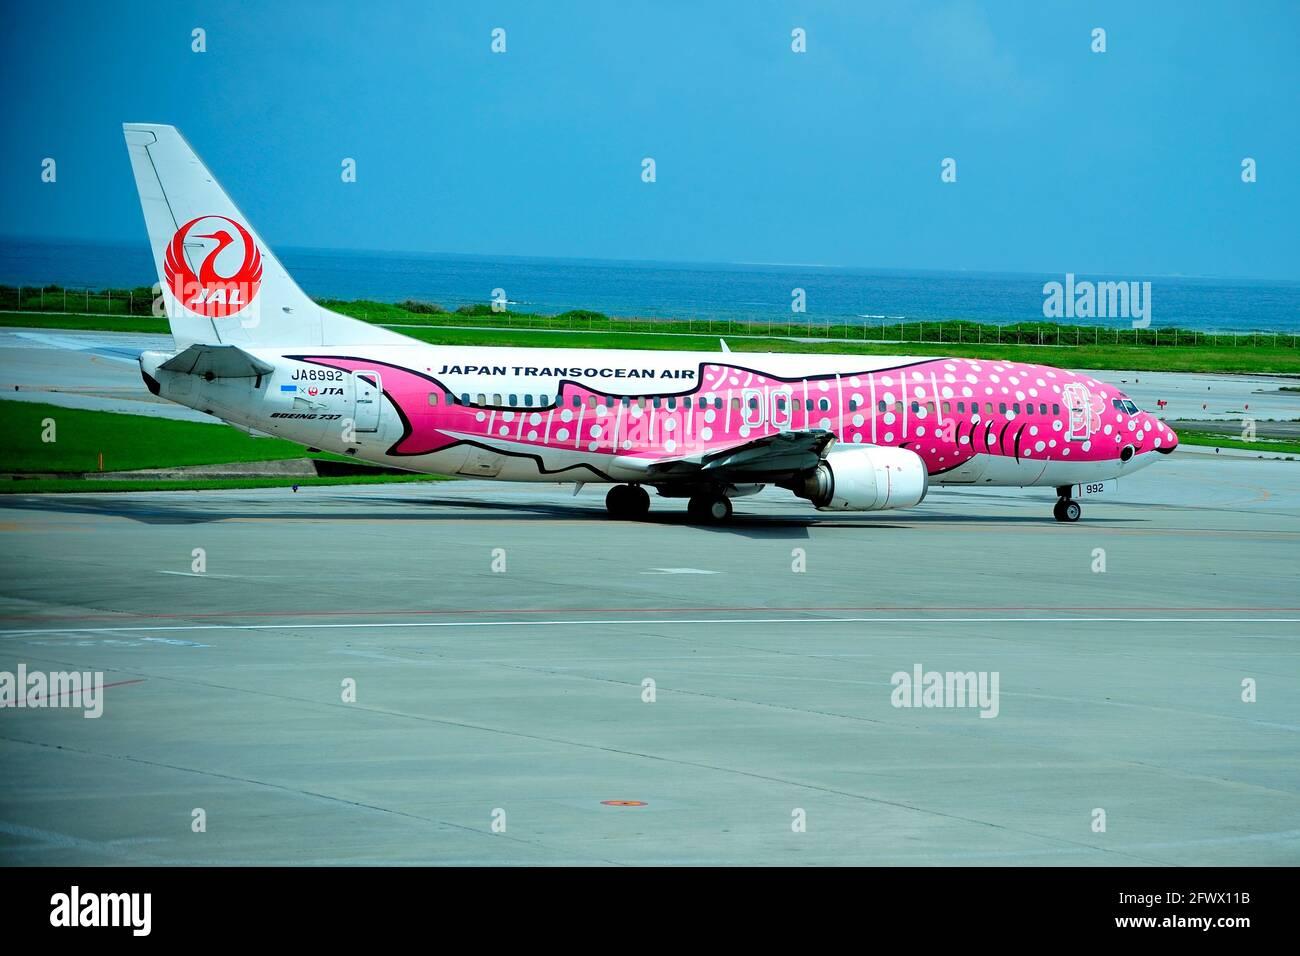 Pink Whale Shark, Japan Transocean, JTA Boeing B-737/400, JA8992, Taxi, To Take Off,  Naha Airport, Naha, Okinawa, Ryukyu Islands, Japan Stock Photo